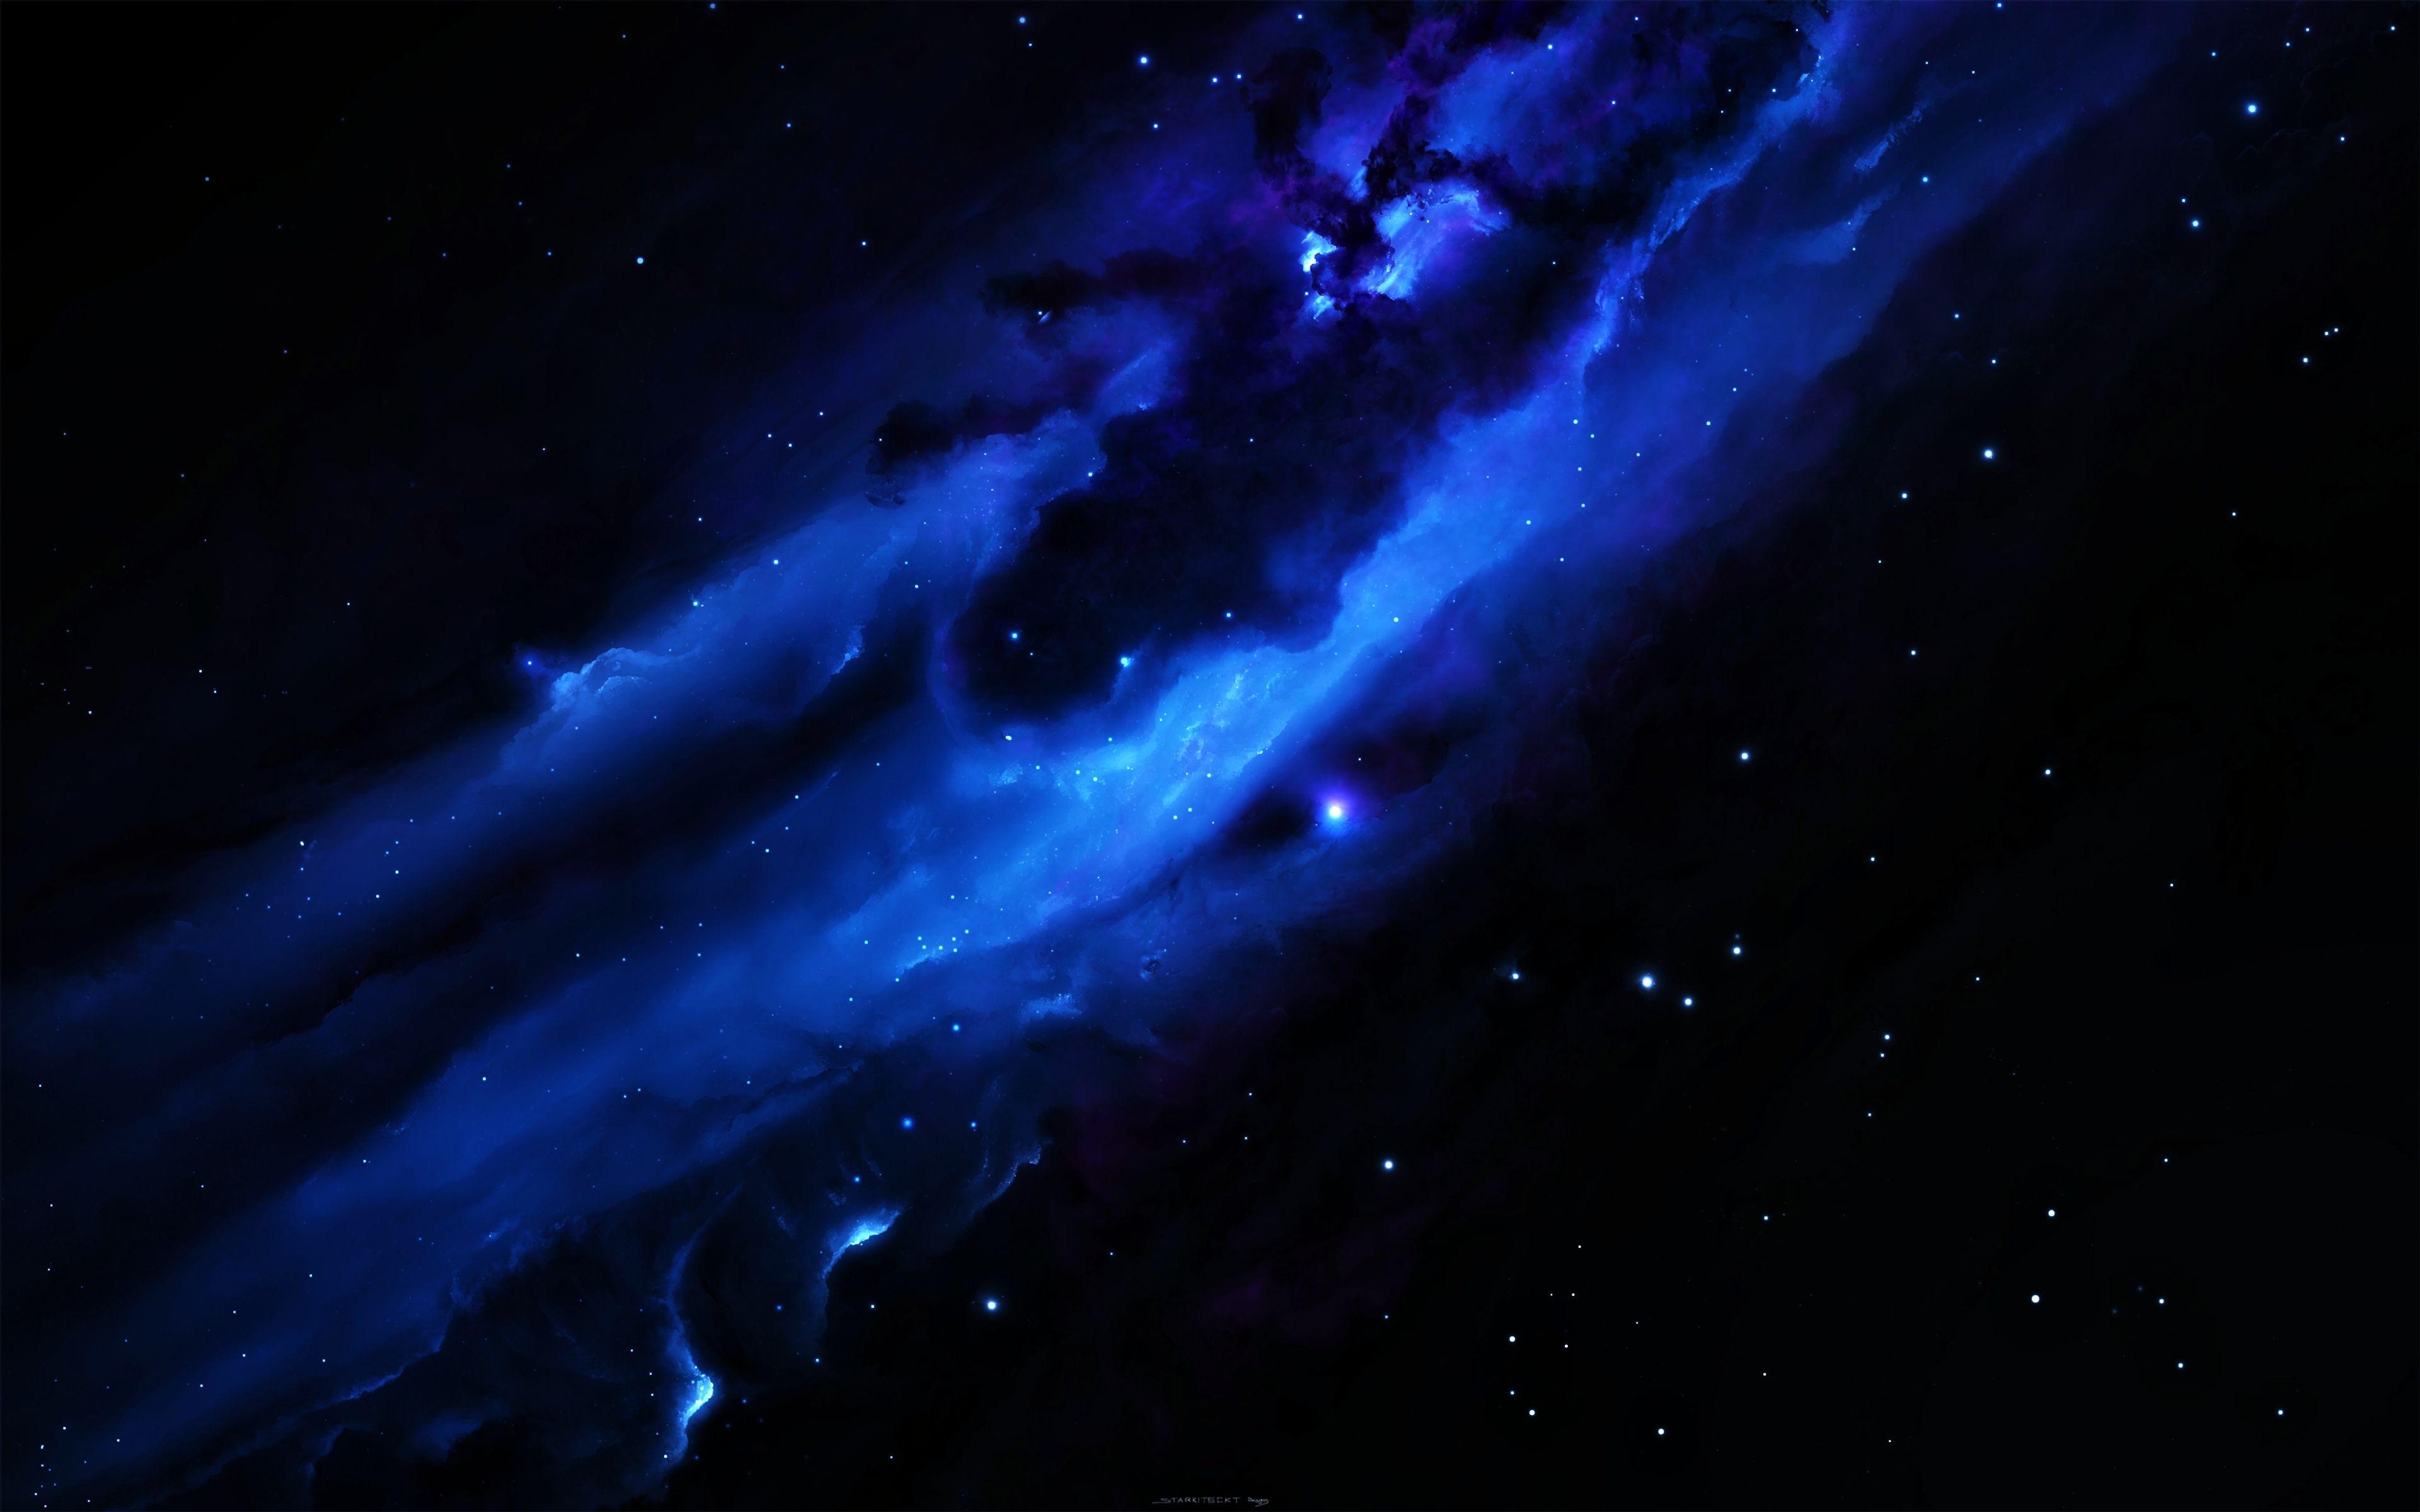 Blue Galaxy Computer Wallpapers Desktop Backgrounds 3840x2400 Id 588412 Galaxy Wallpaper Blue Galaxy Wallpaper Space Wallpapers